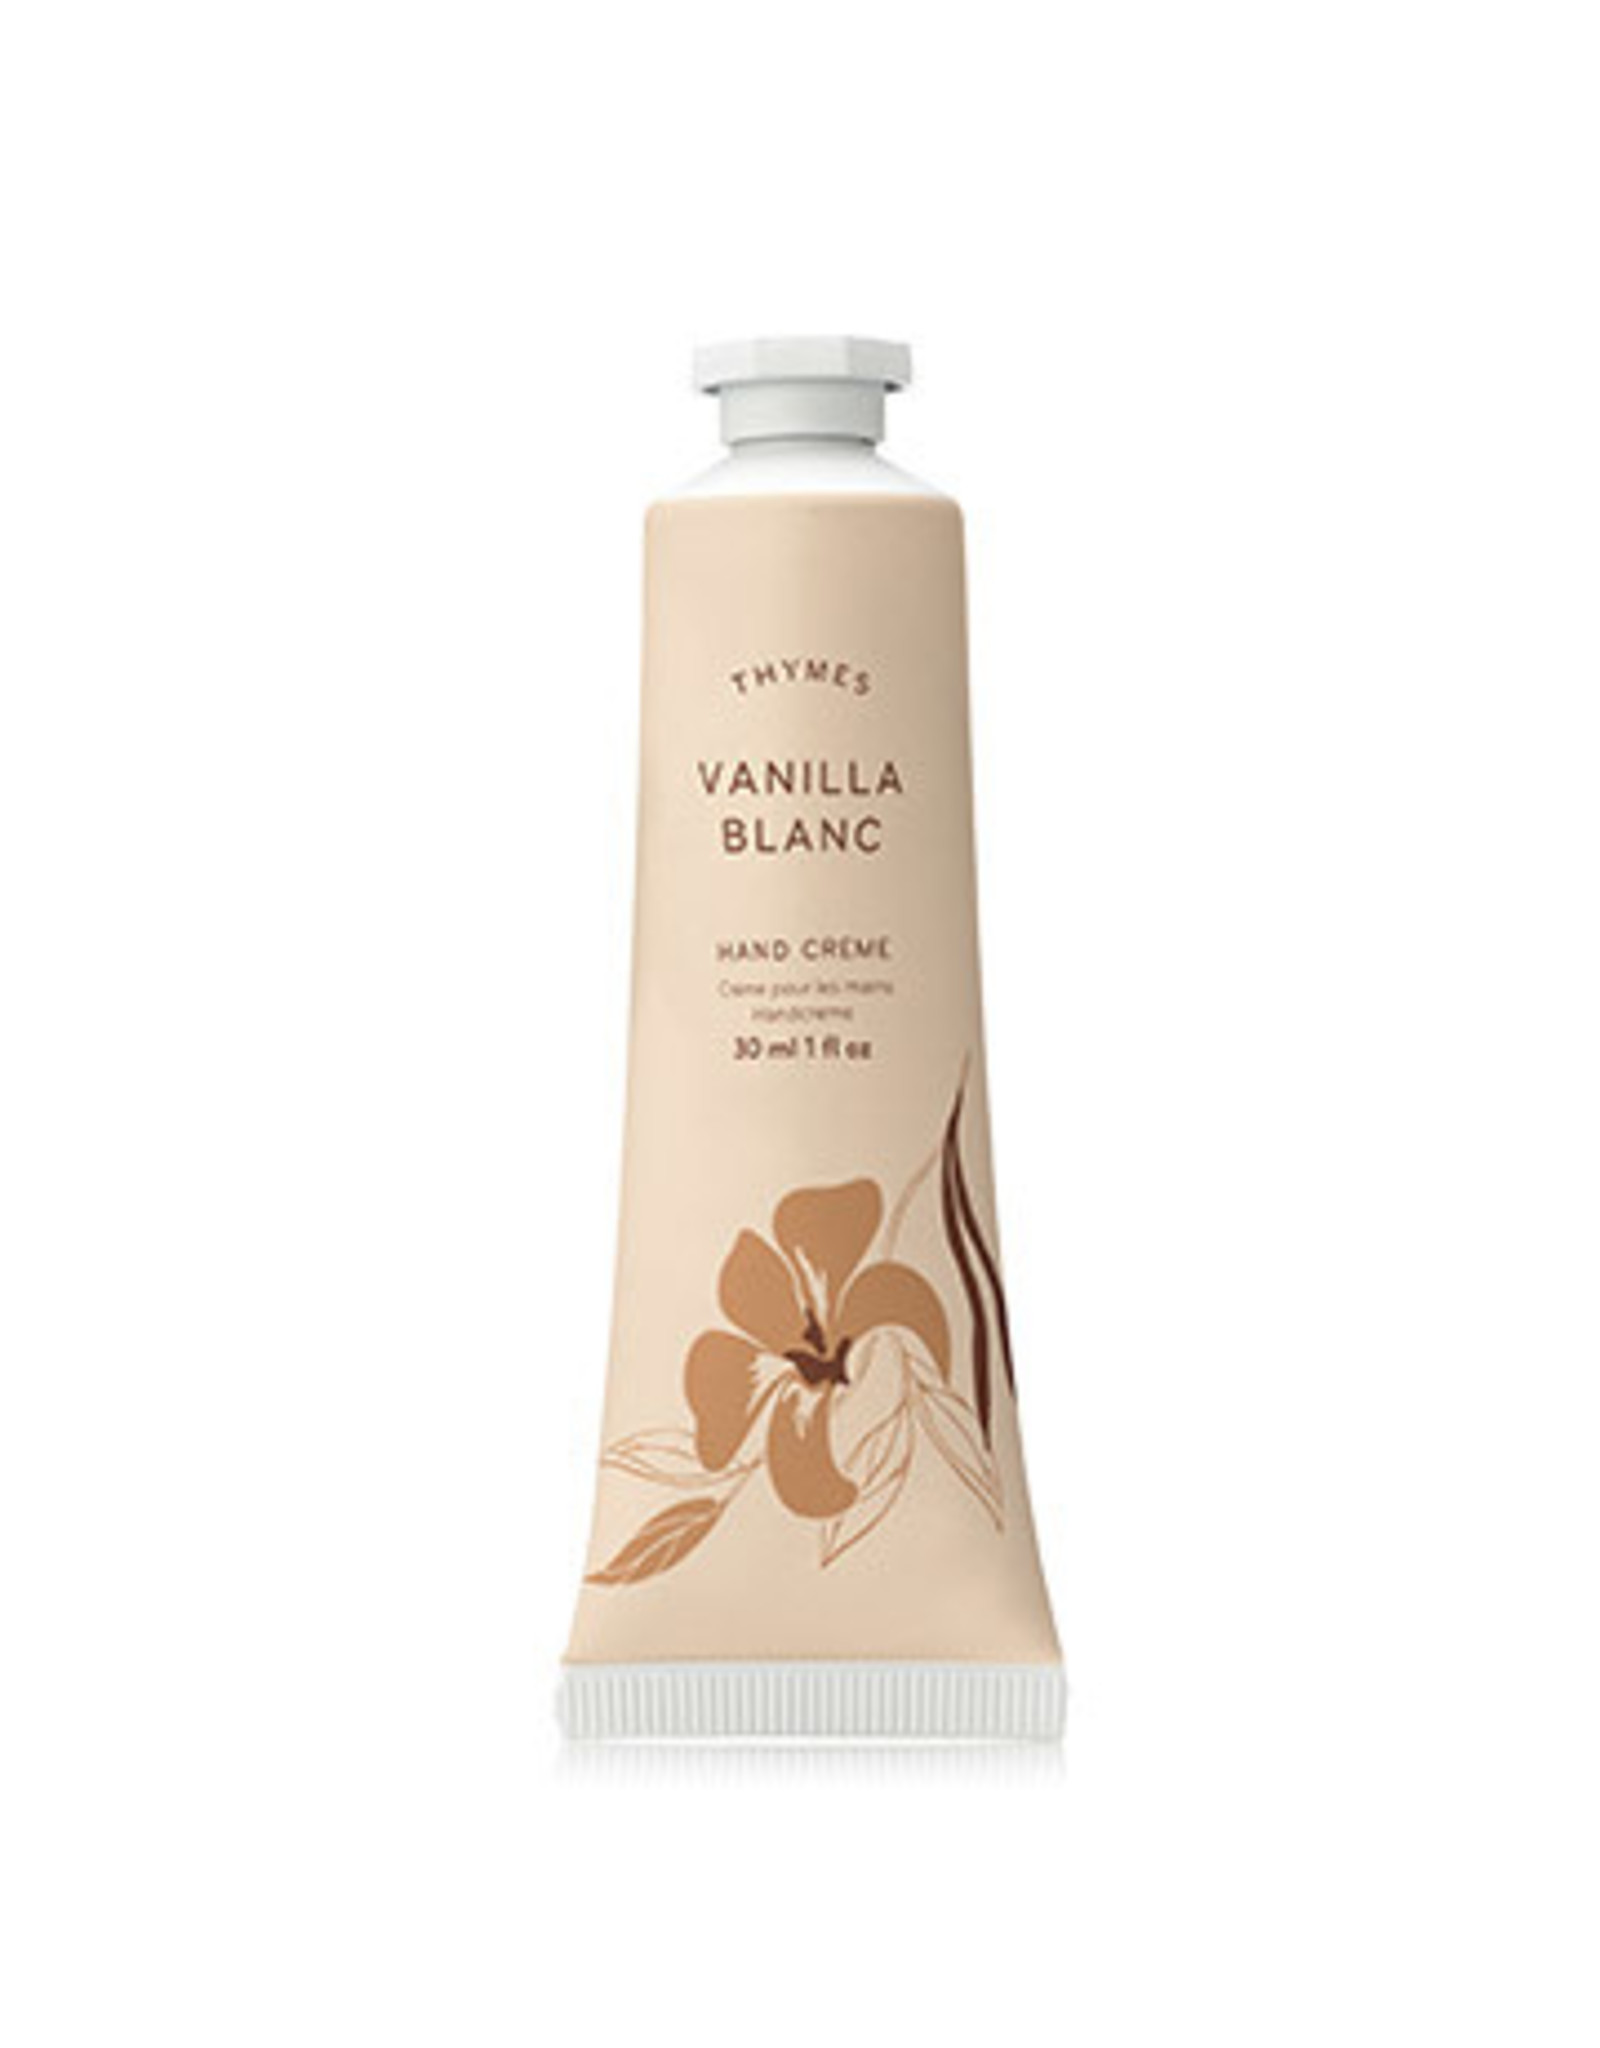 Thymes Vanilla Blanc Petite Hand Creme